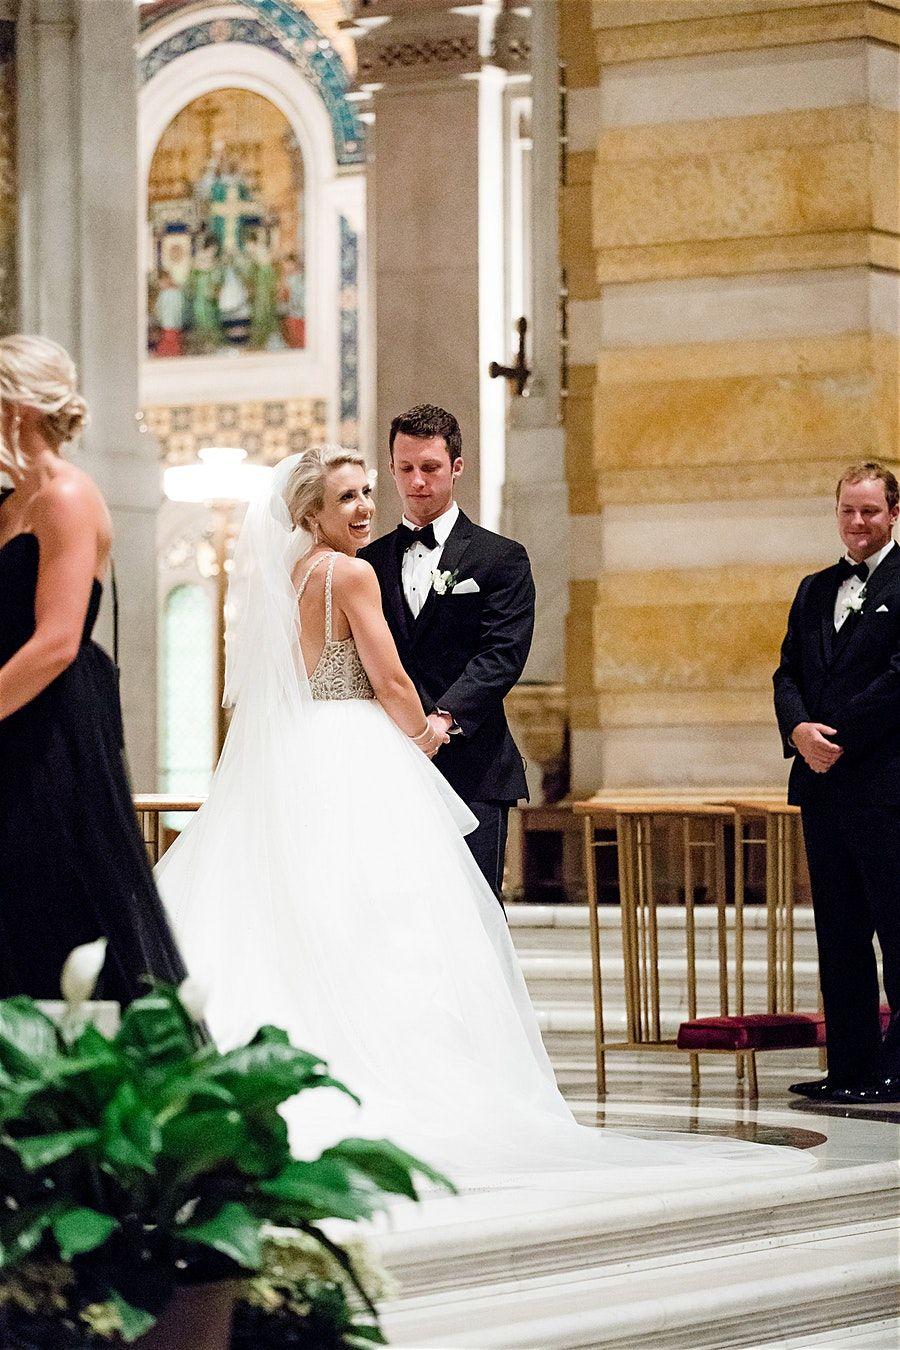 Wedding Photos By Saint Louis Wedding Photographer Ashley Fisher Photography Wedding Ceremony At The Cathedral Bas St Louis Wedding Wedding Ceremony Ceremony